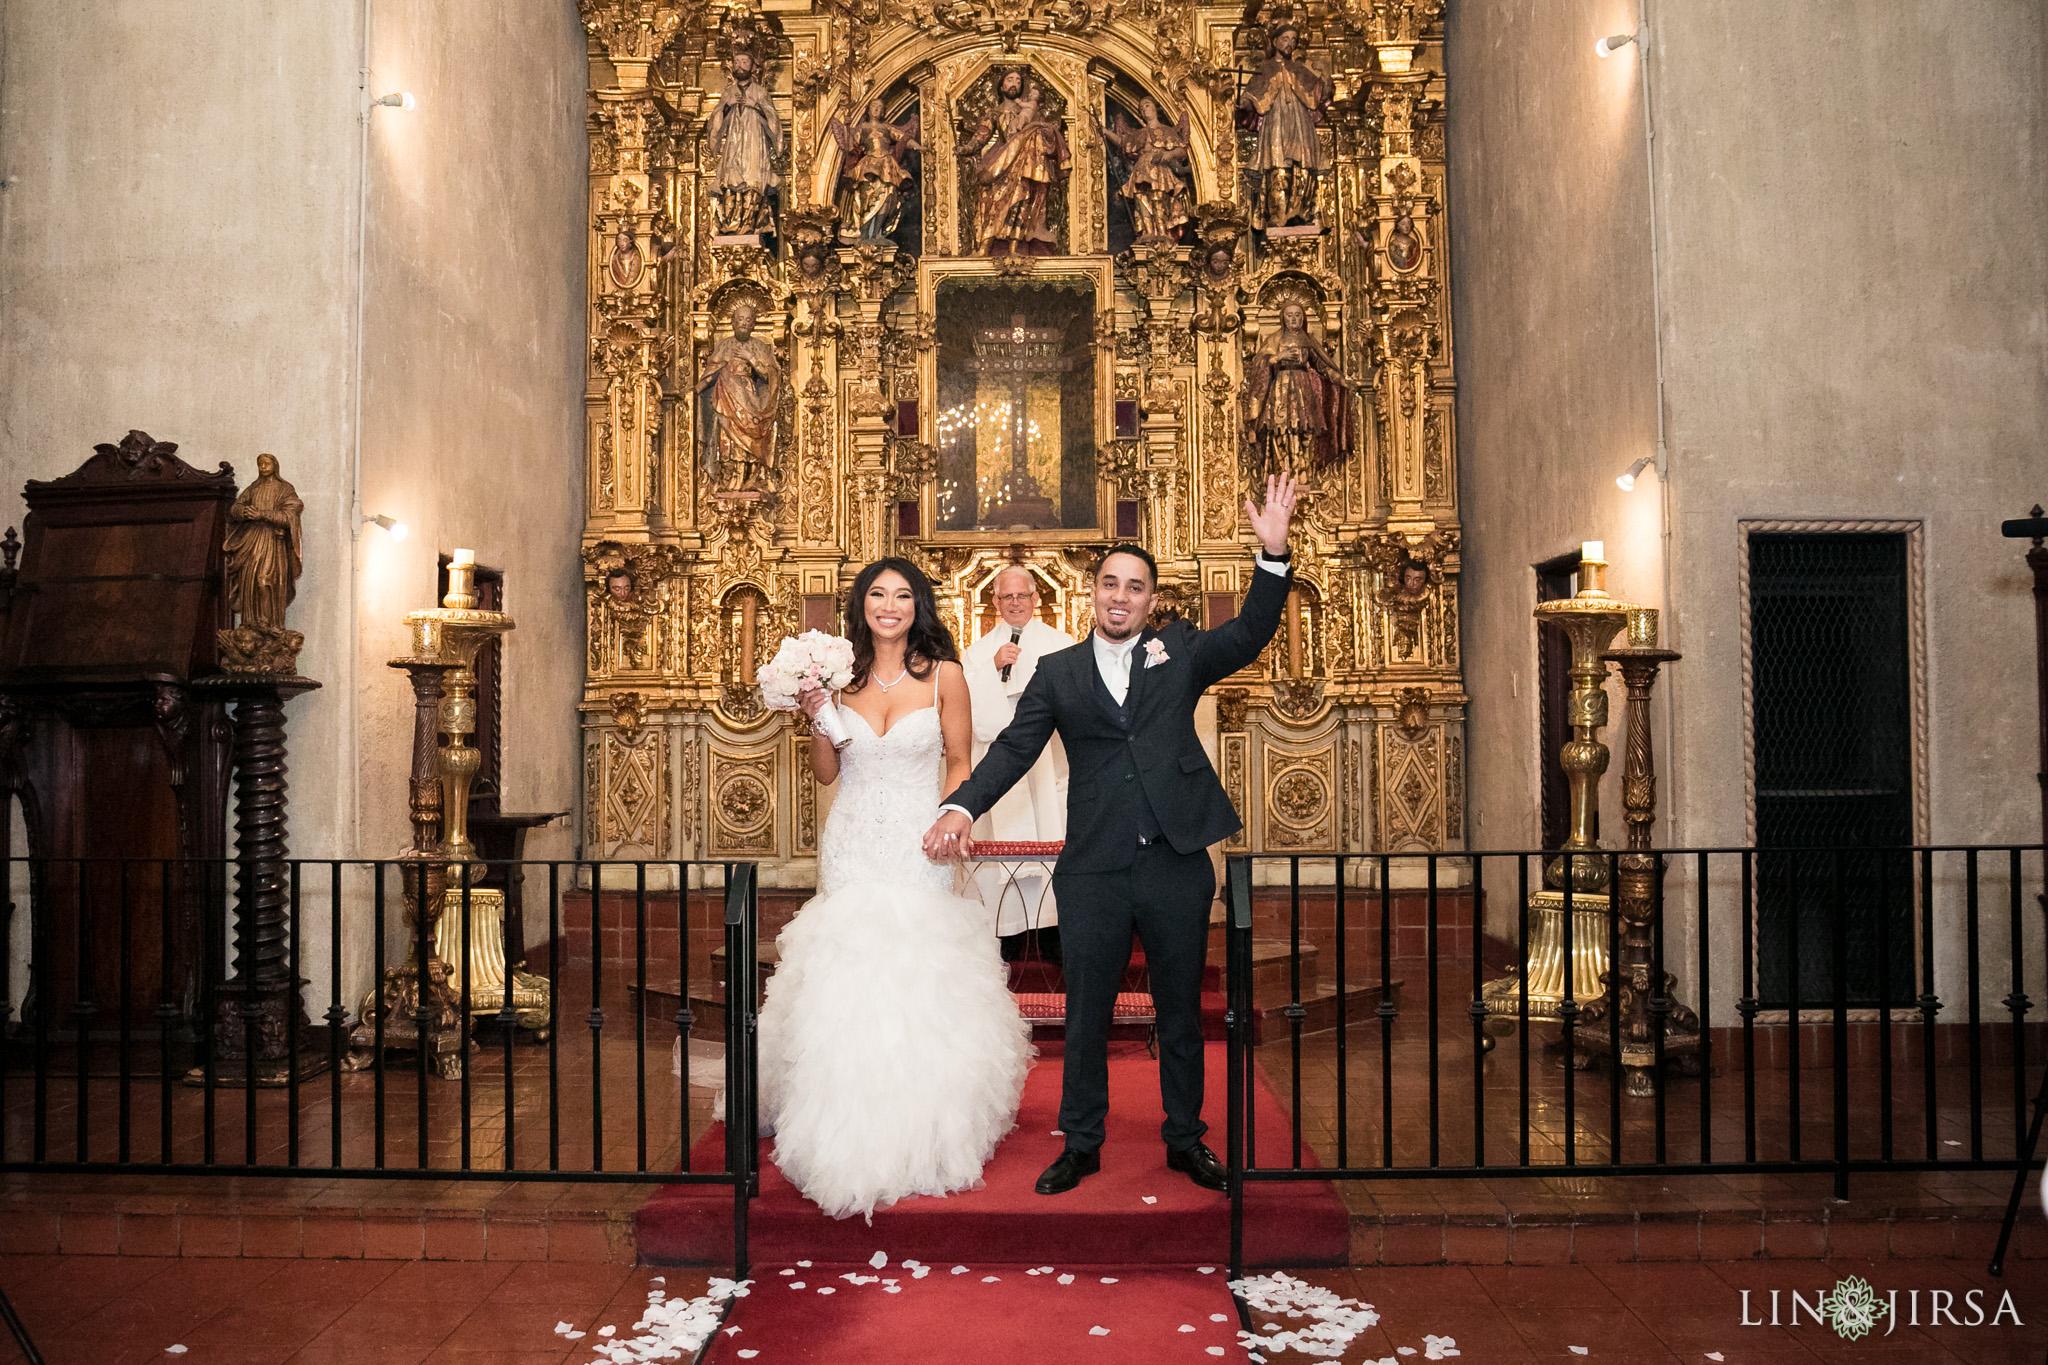 20-mission-inn-riverside-wedding-photography